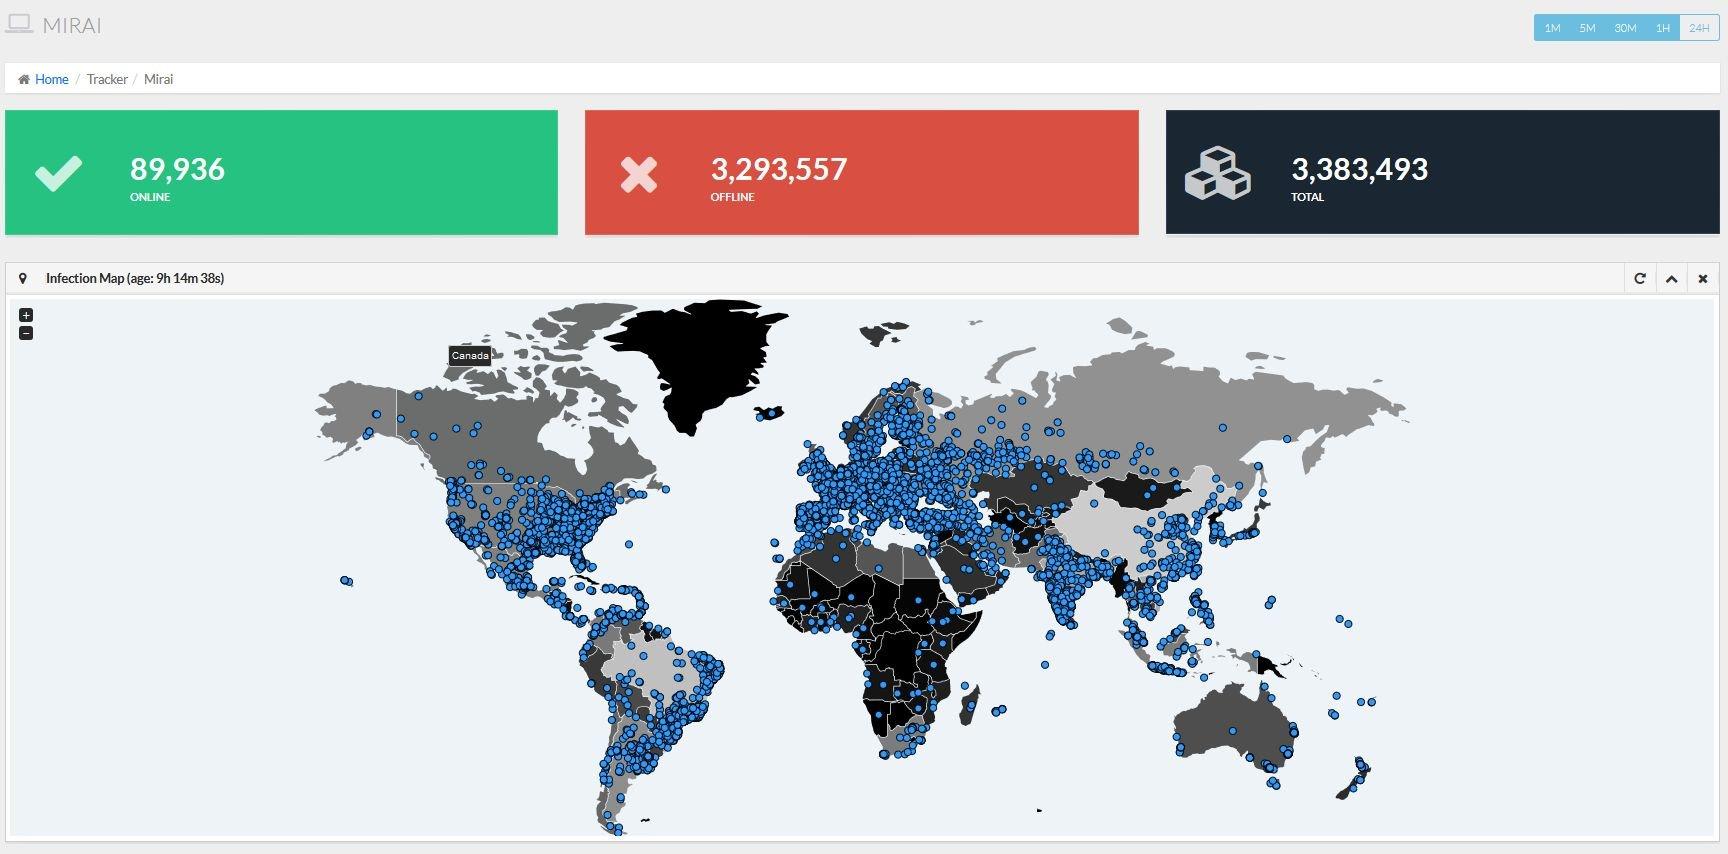 Tracker des Mirai-Botnetz